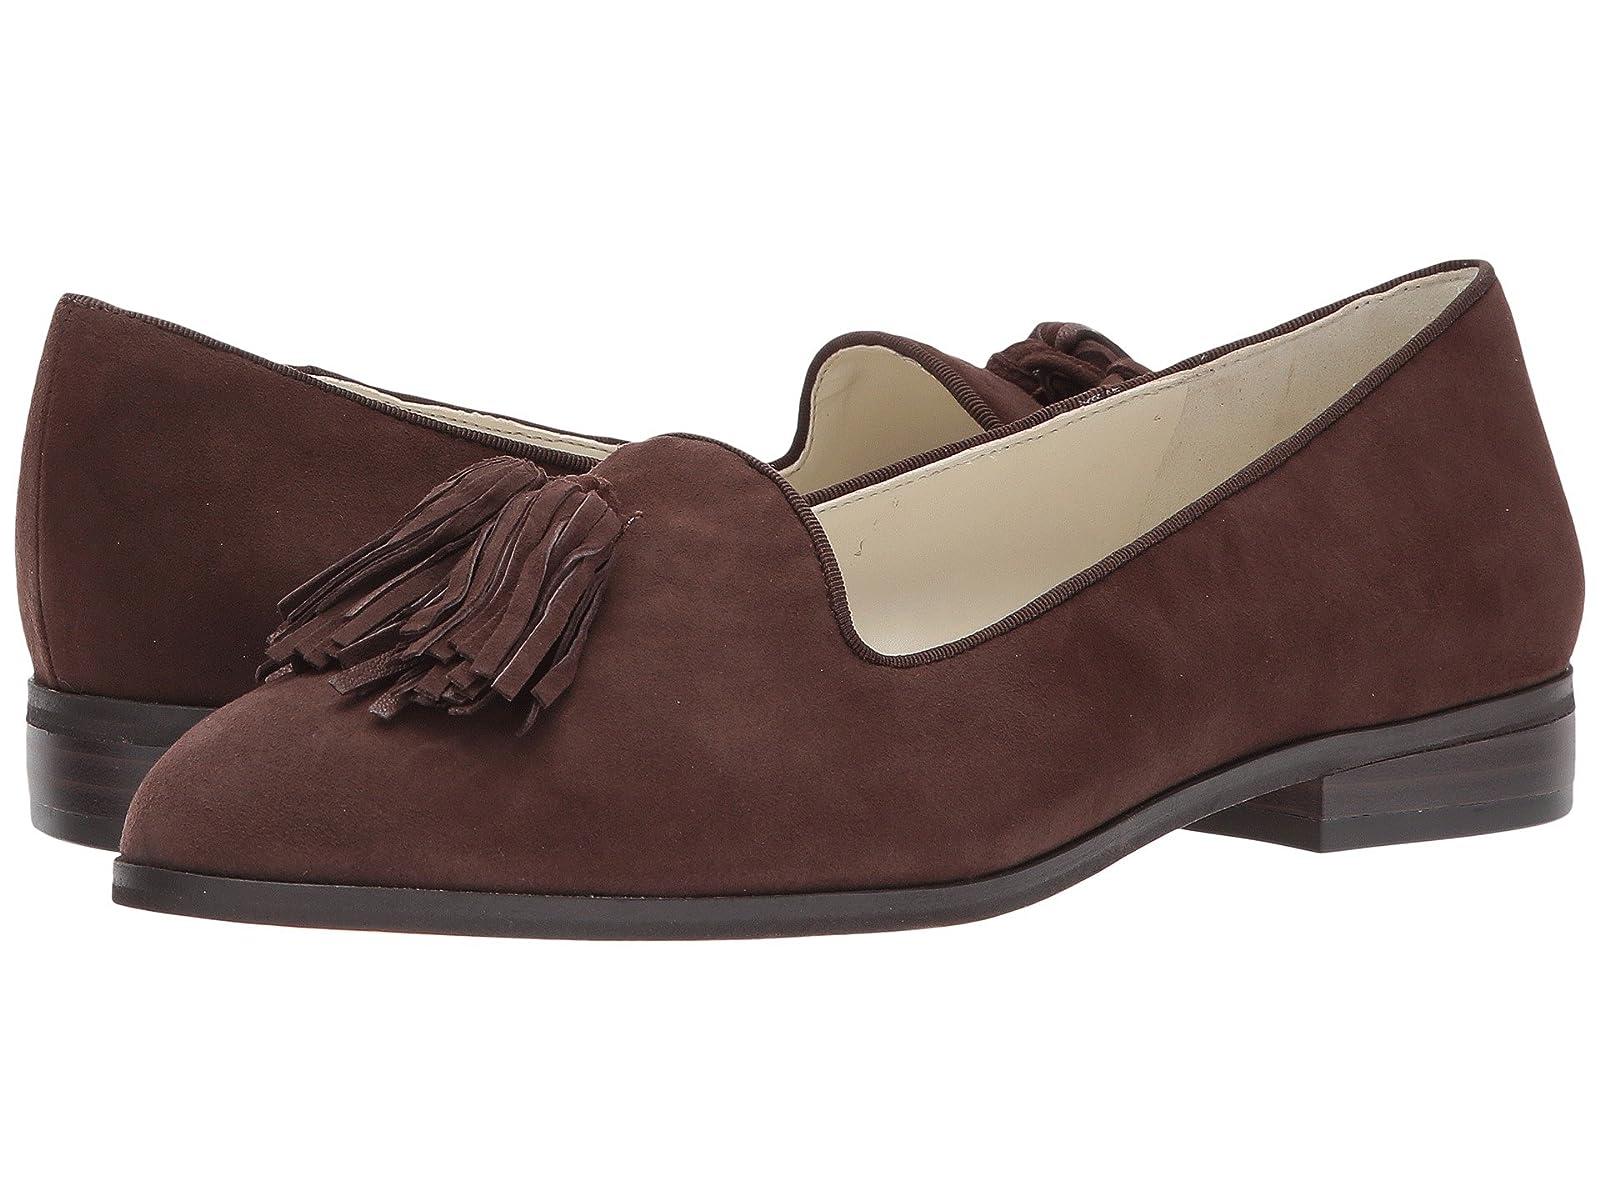 Anne Klein DevinaCheap and distinctive eye-catching shoes